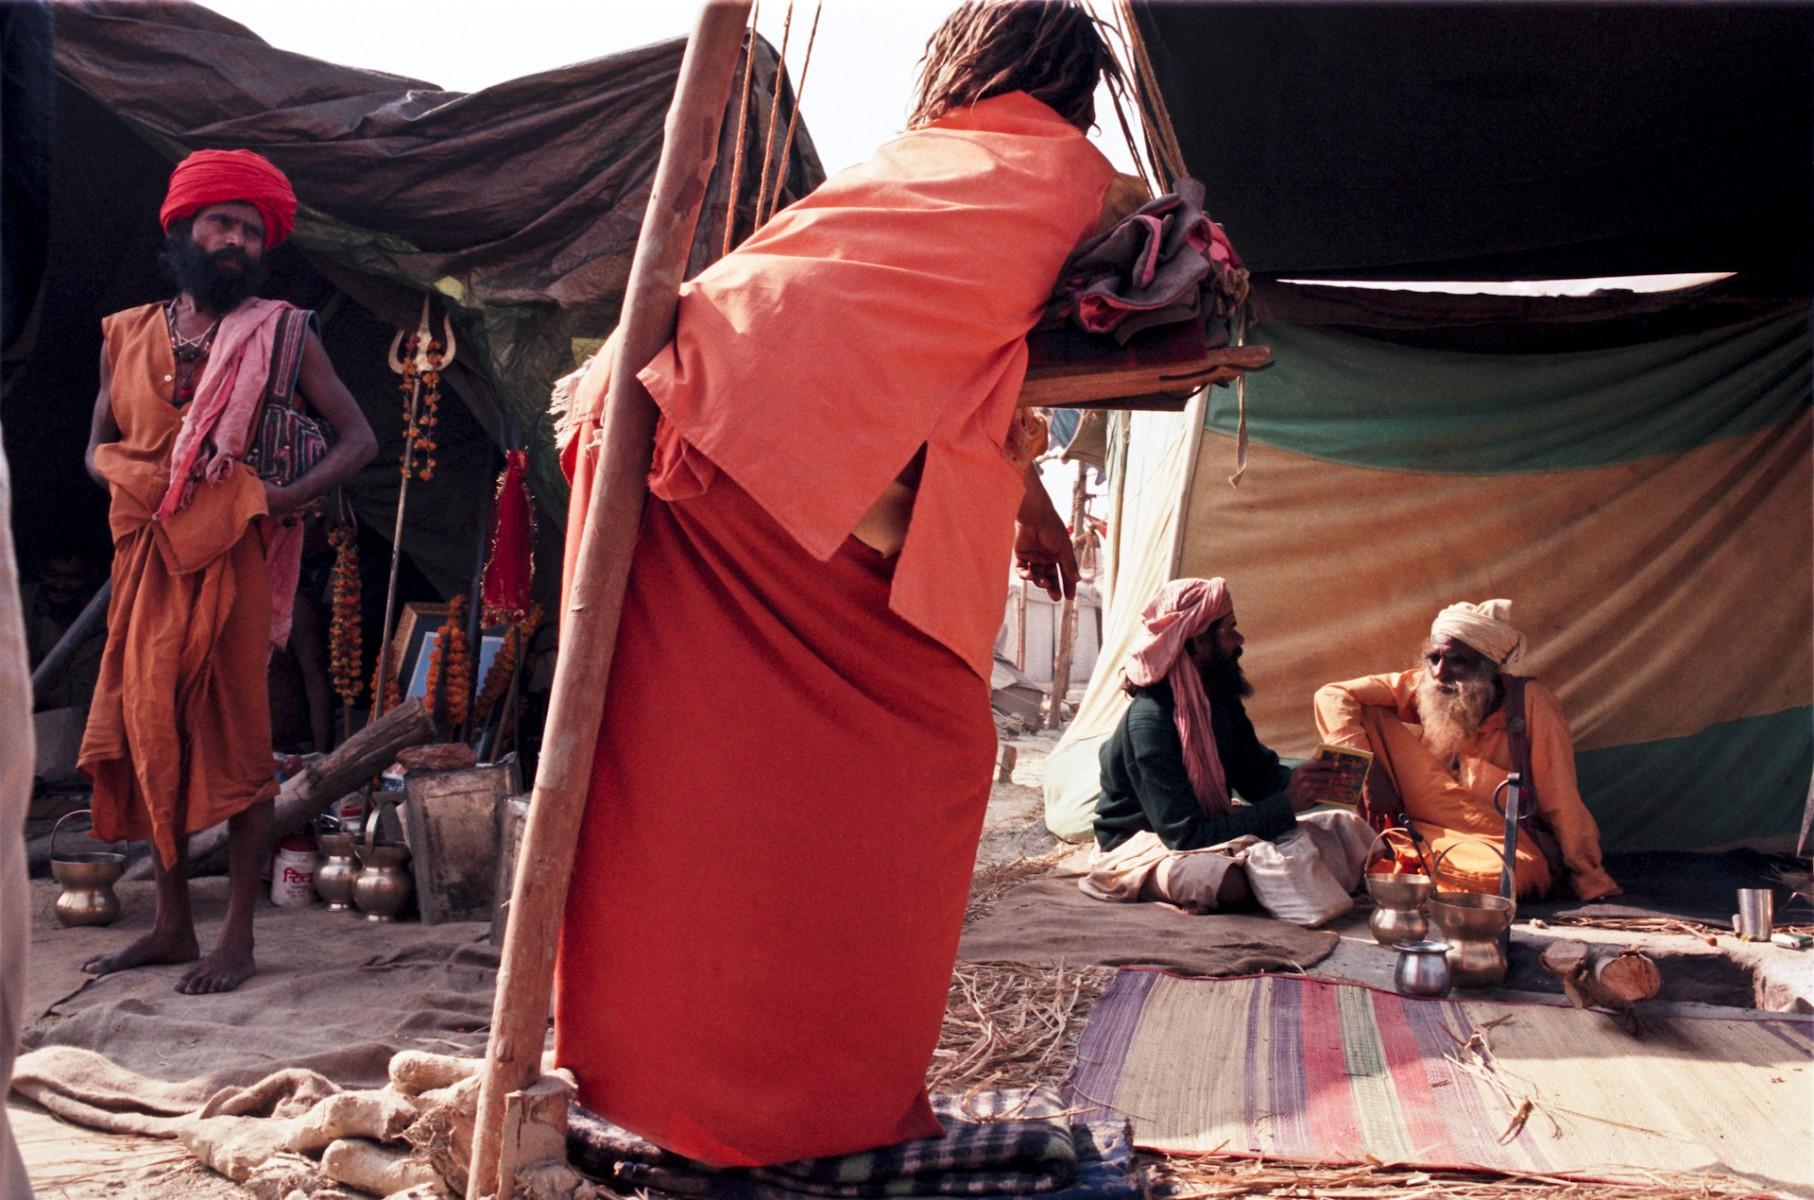 Hindu Austerity, Kumbh Mela, Allahabad